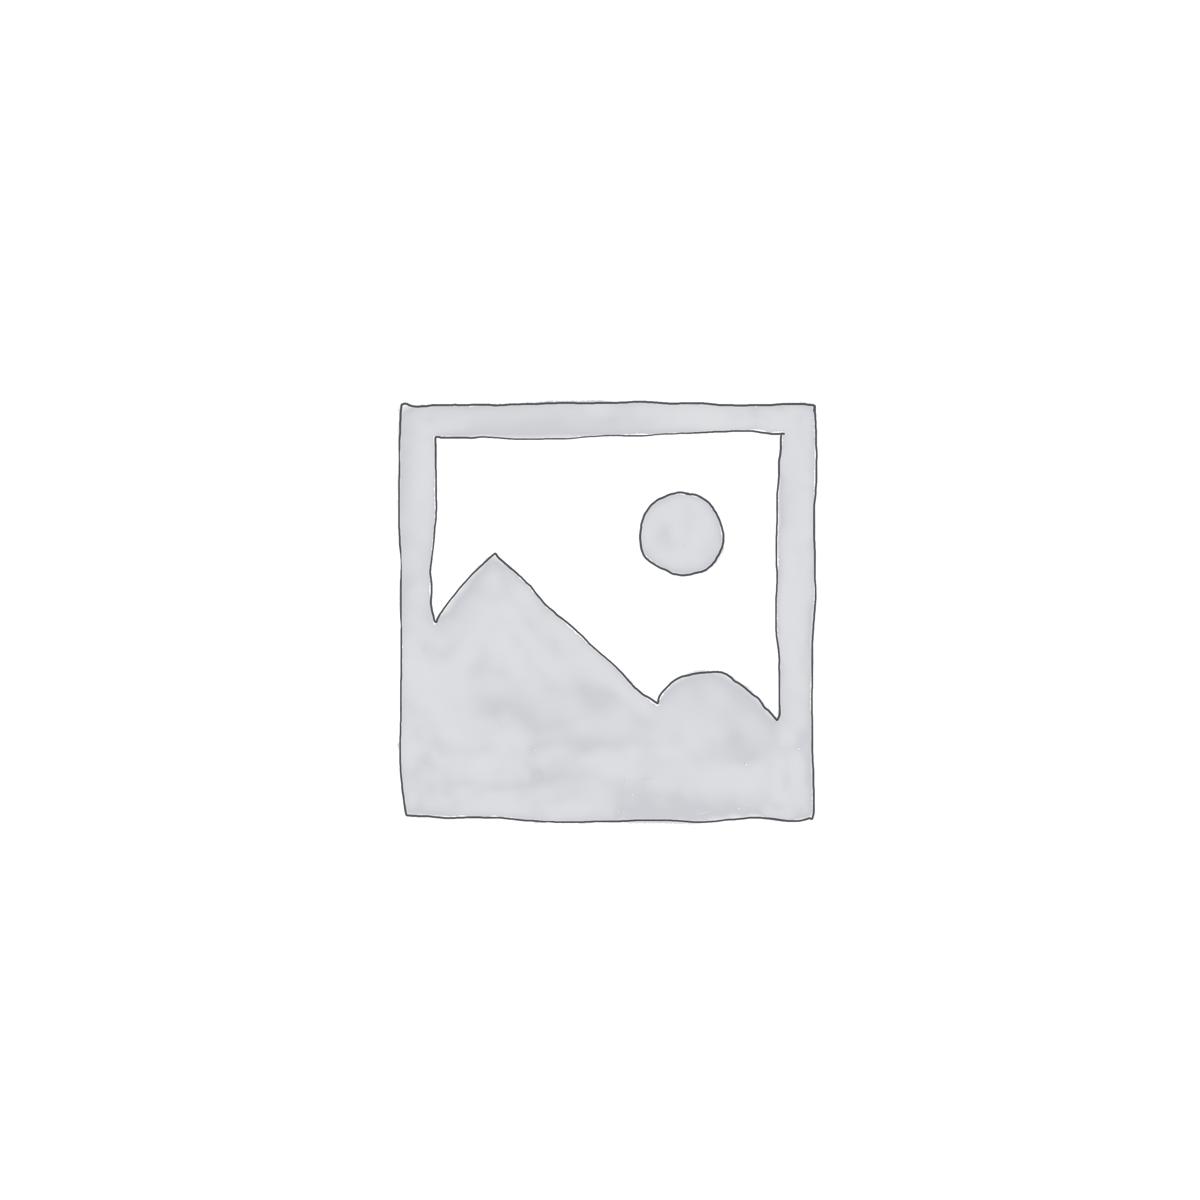 Drawing Art Sunflowers Wallpaper Mural